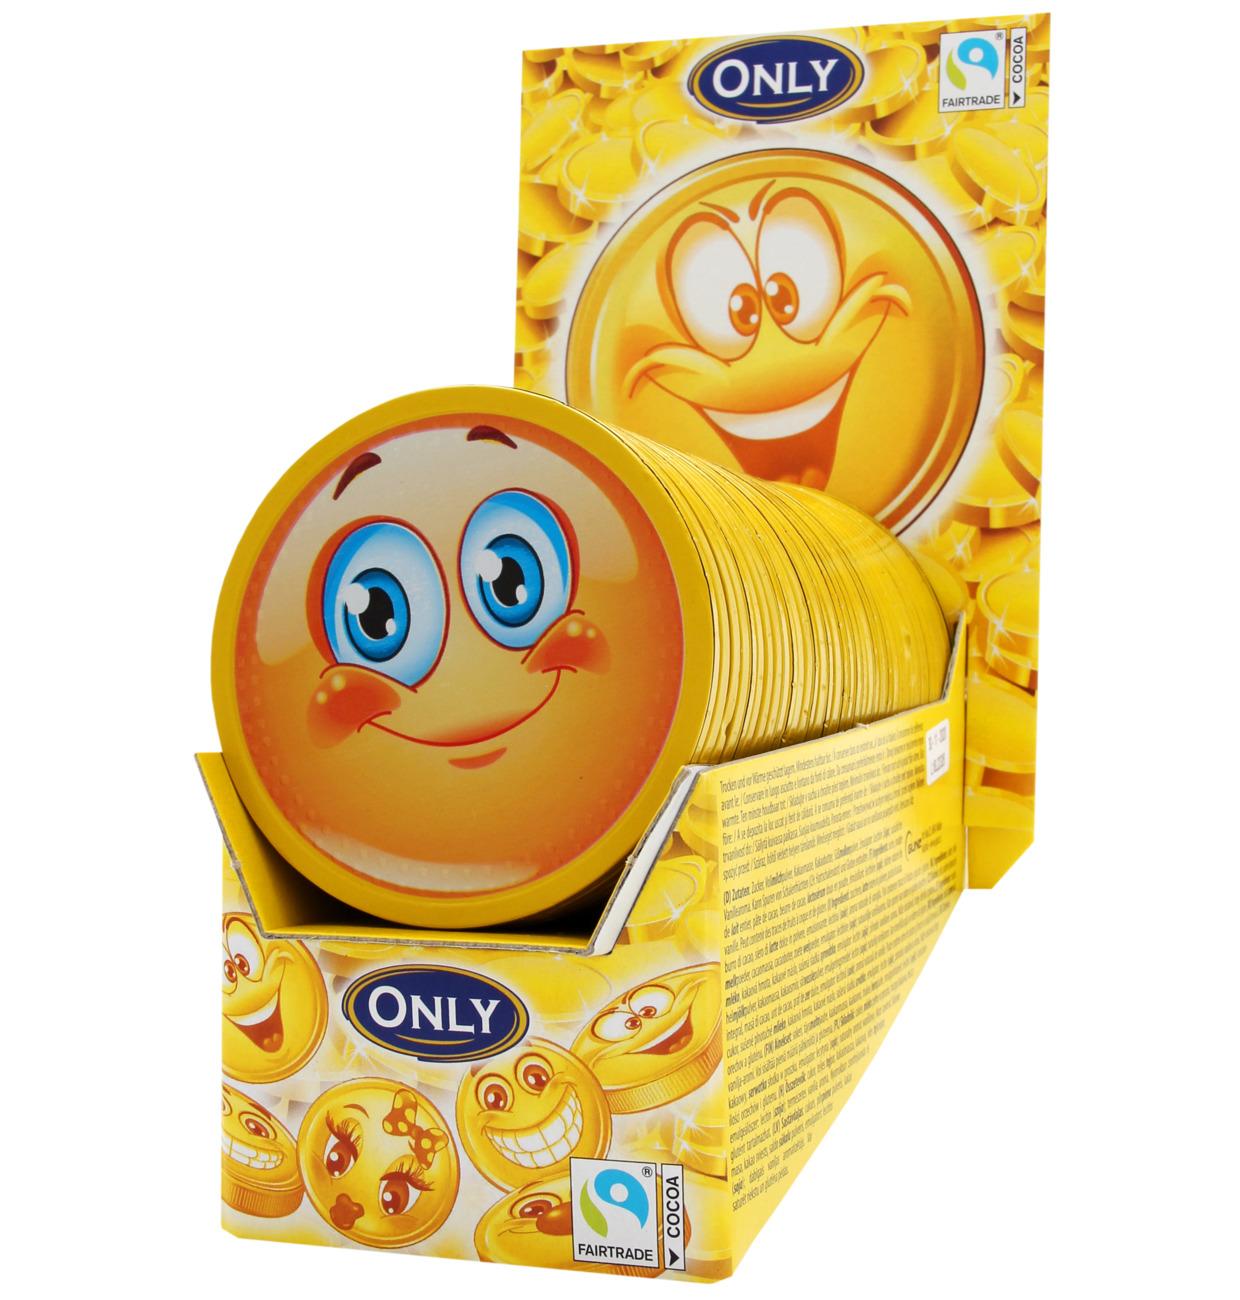 Emoji-Taler Milchschokolade Thekendisplay